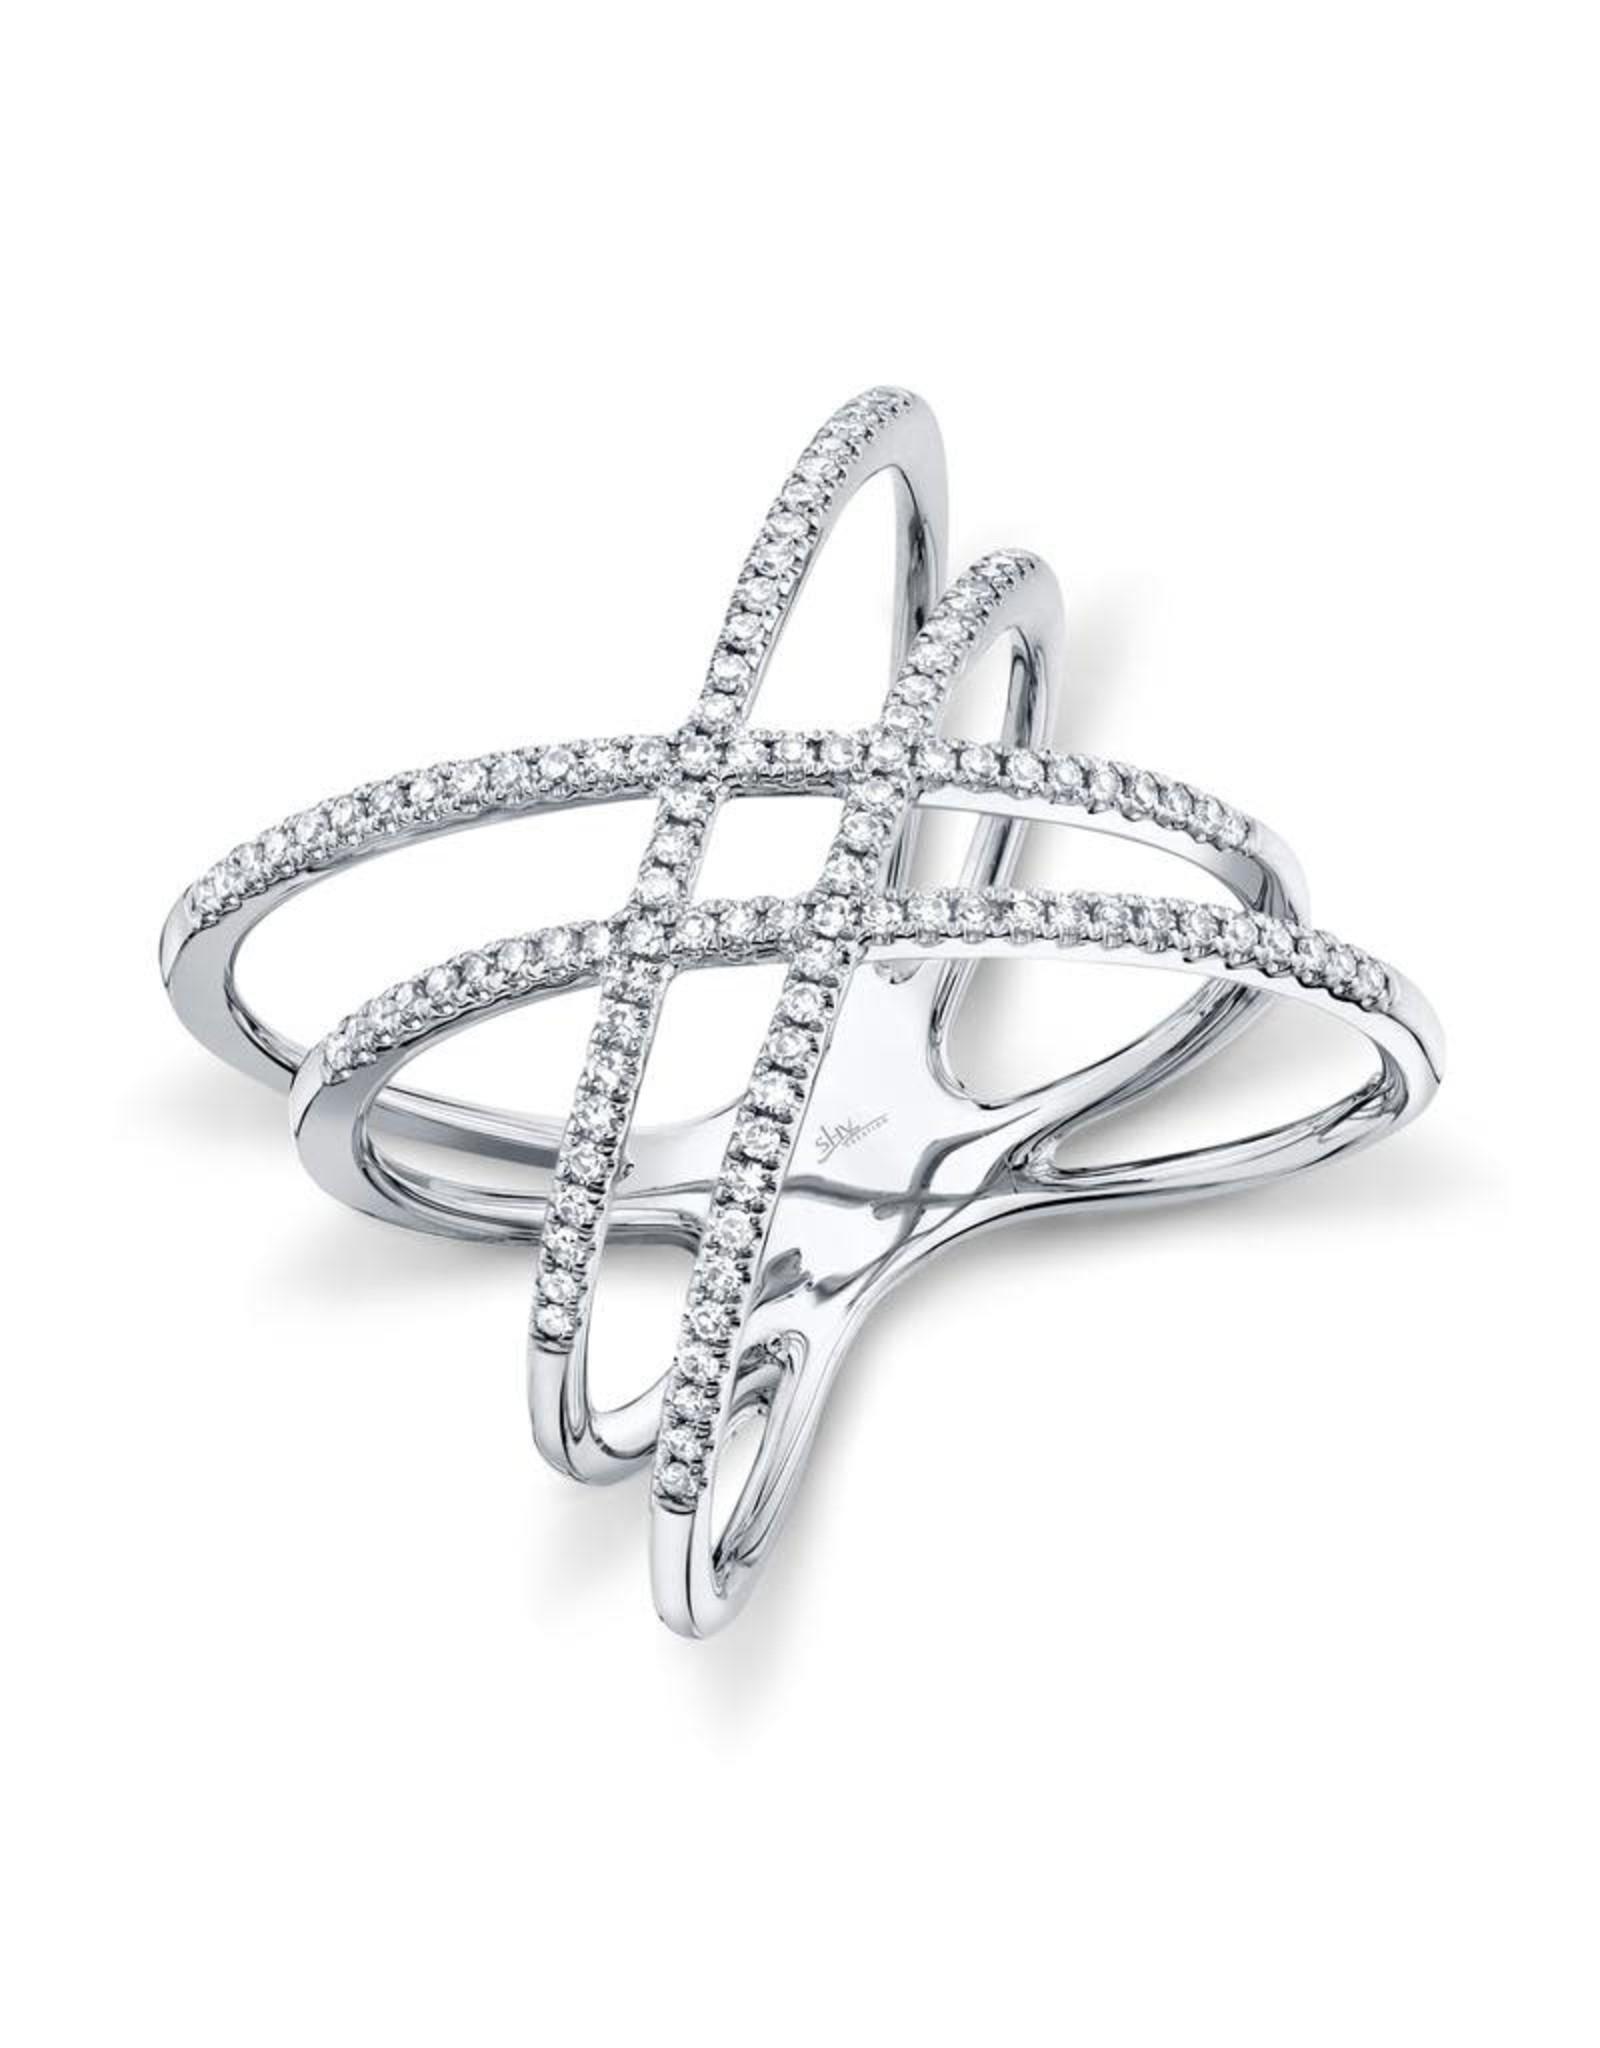 14K White Gold Double Diamond Criss Cross Ring, D: 0.32ct